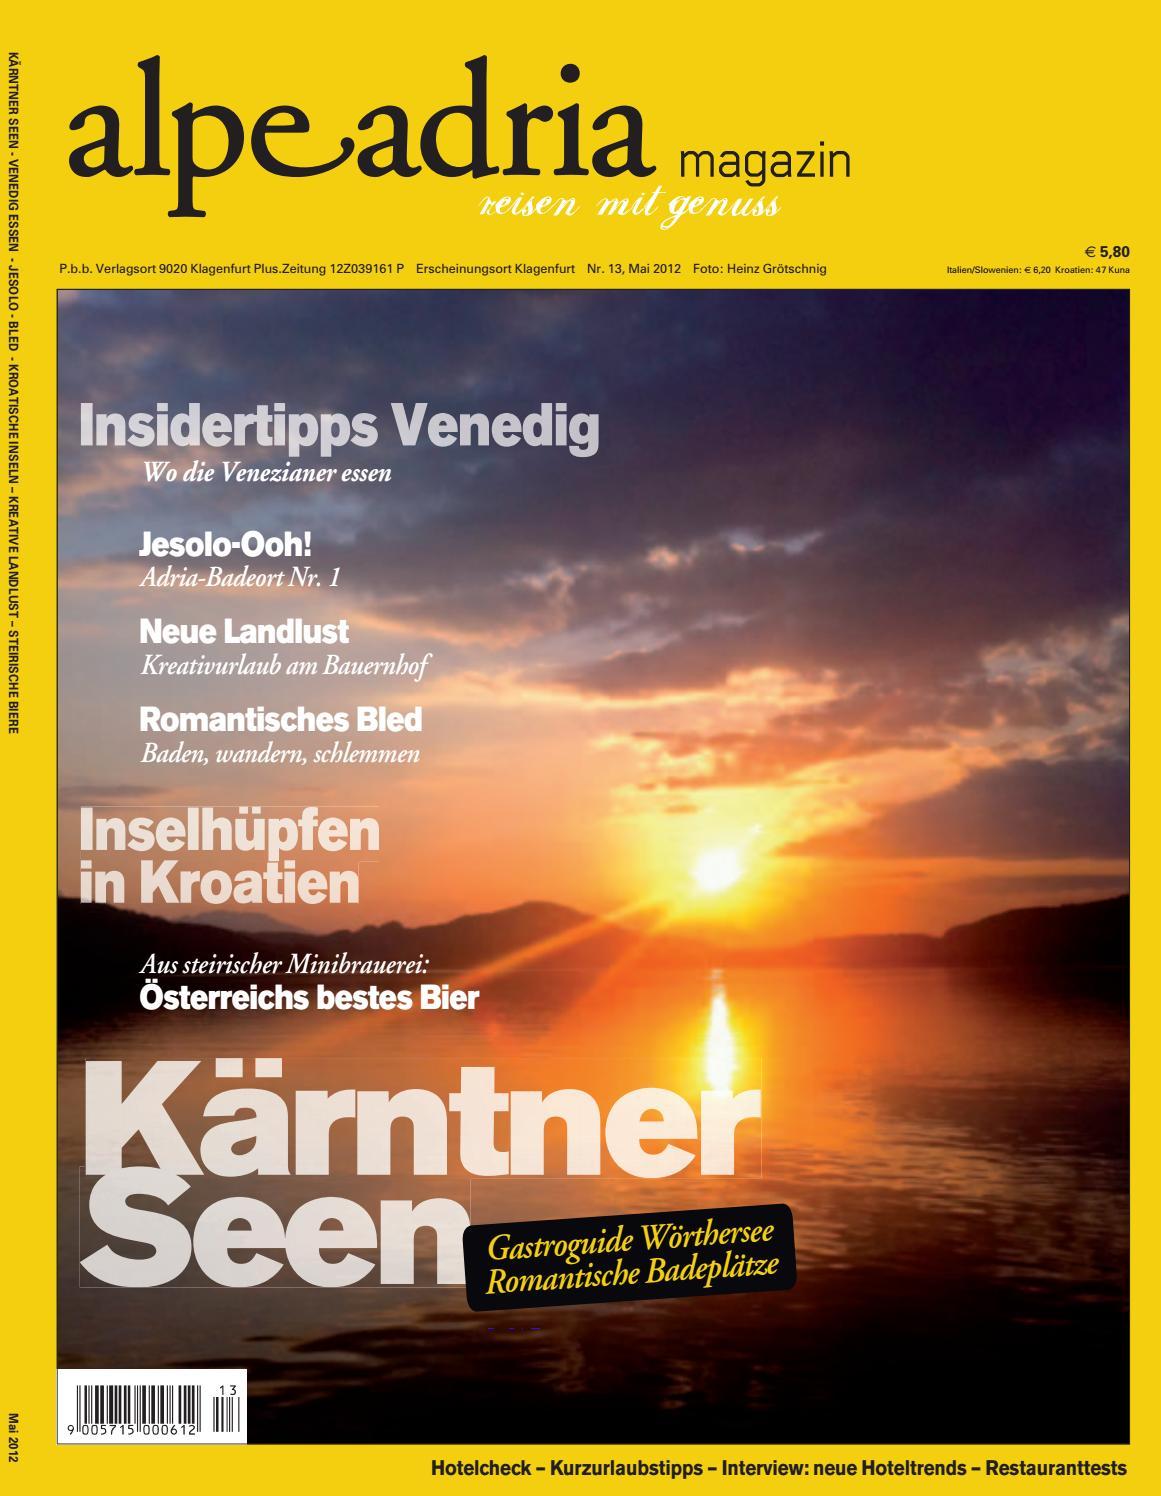 Alpe Adria Magazin AAM 13 Mai 2012 By Bundeslnderinnen